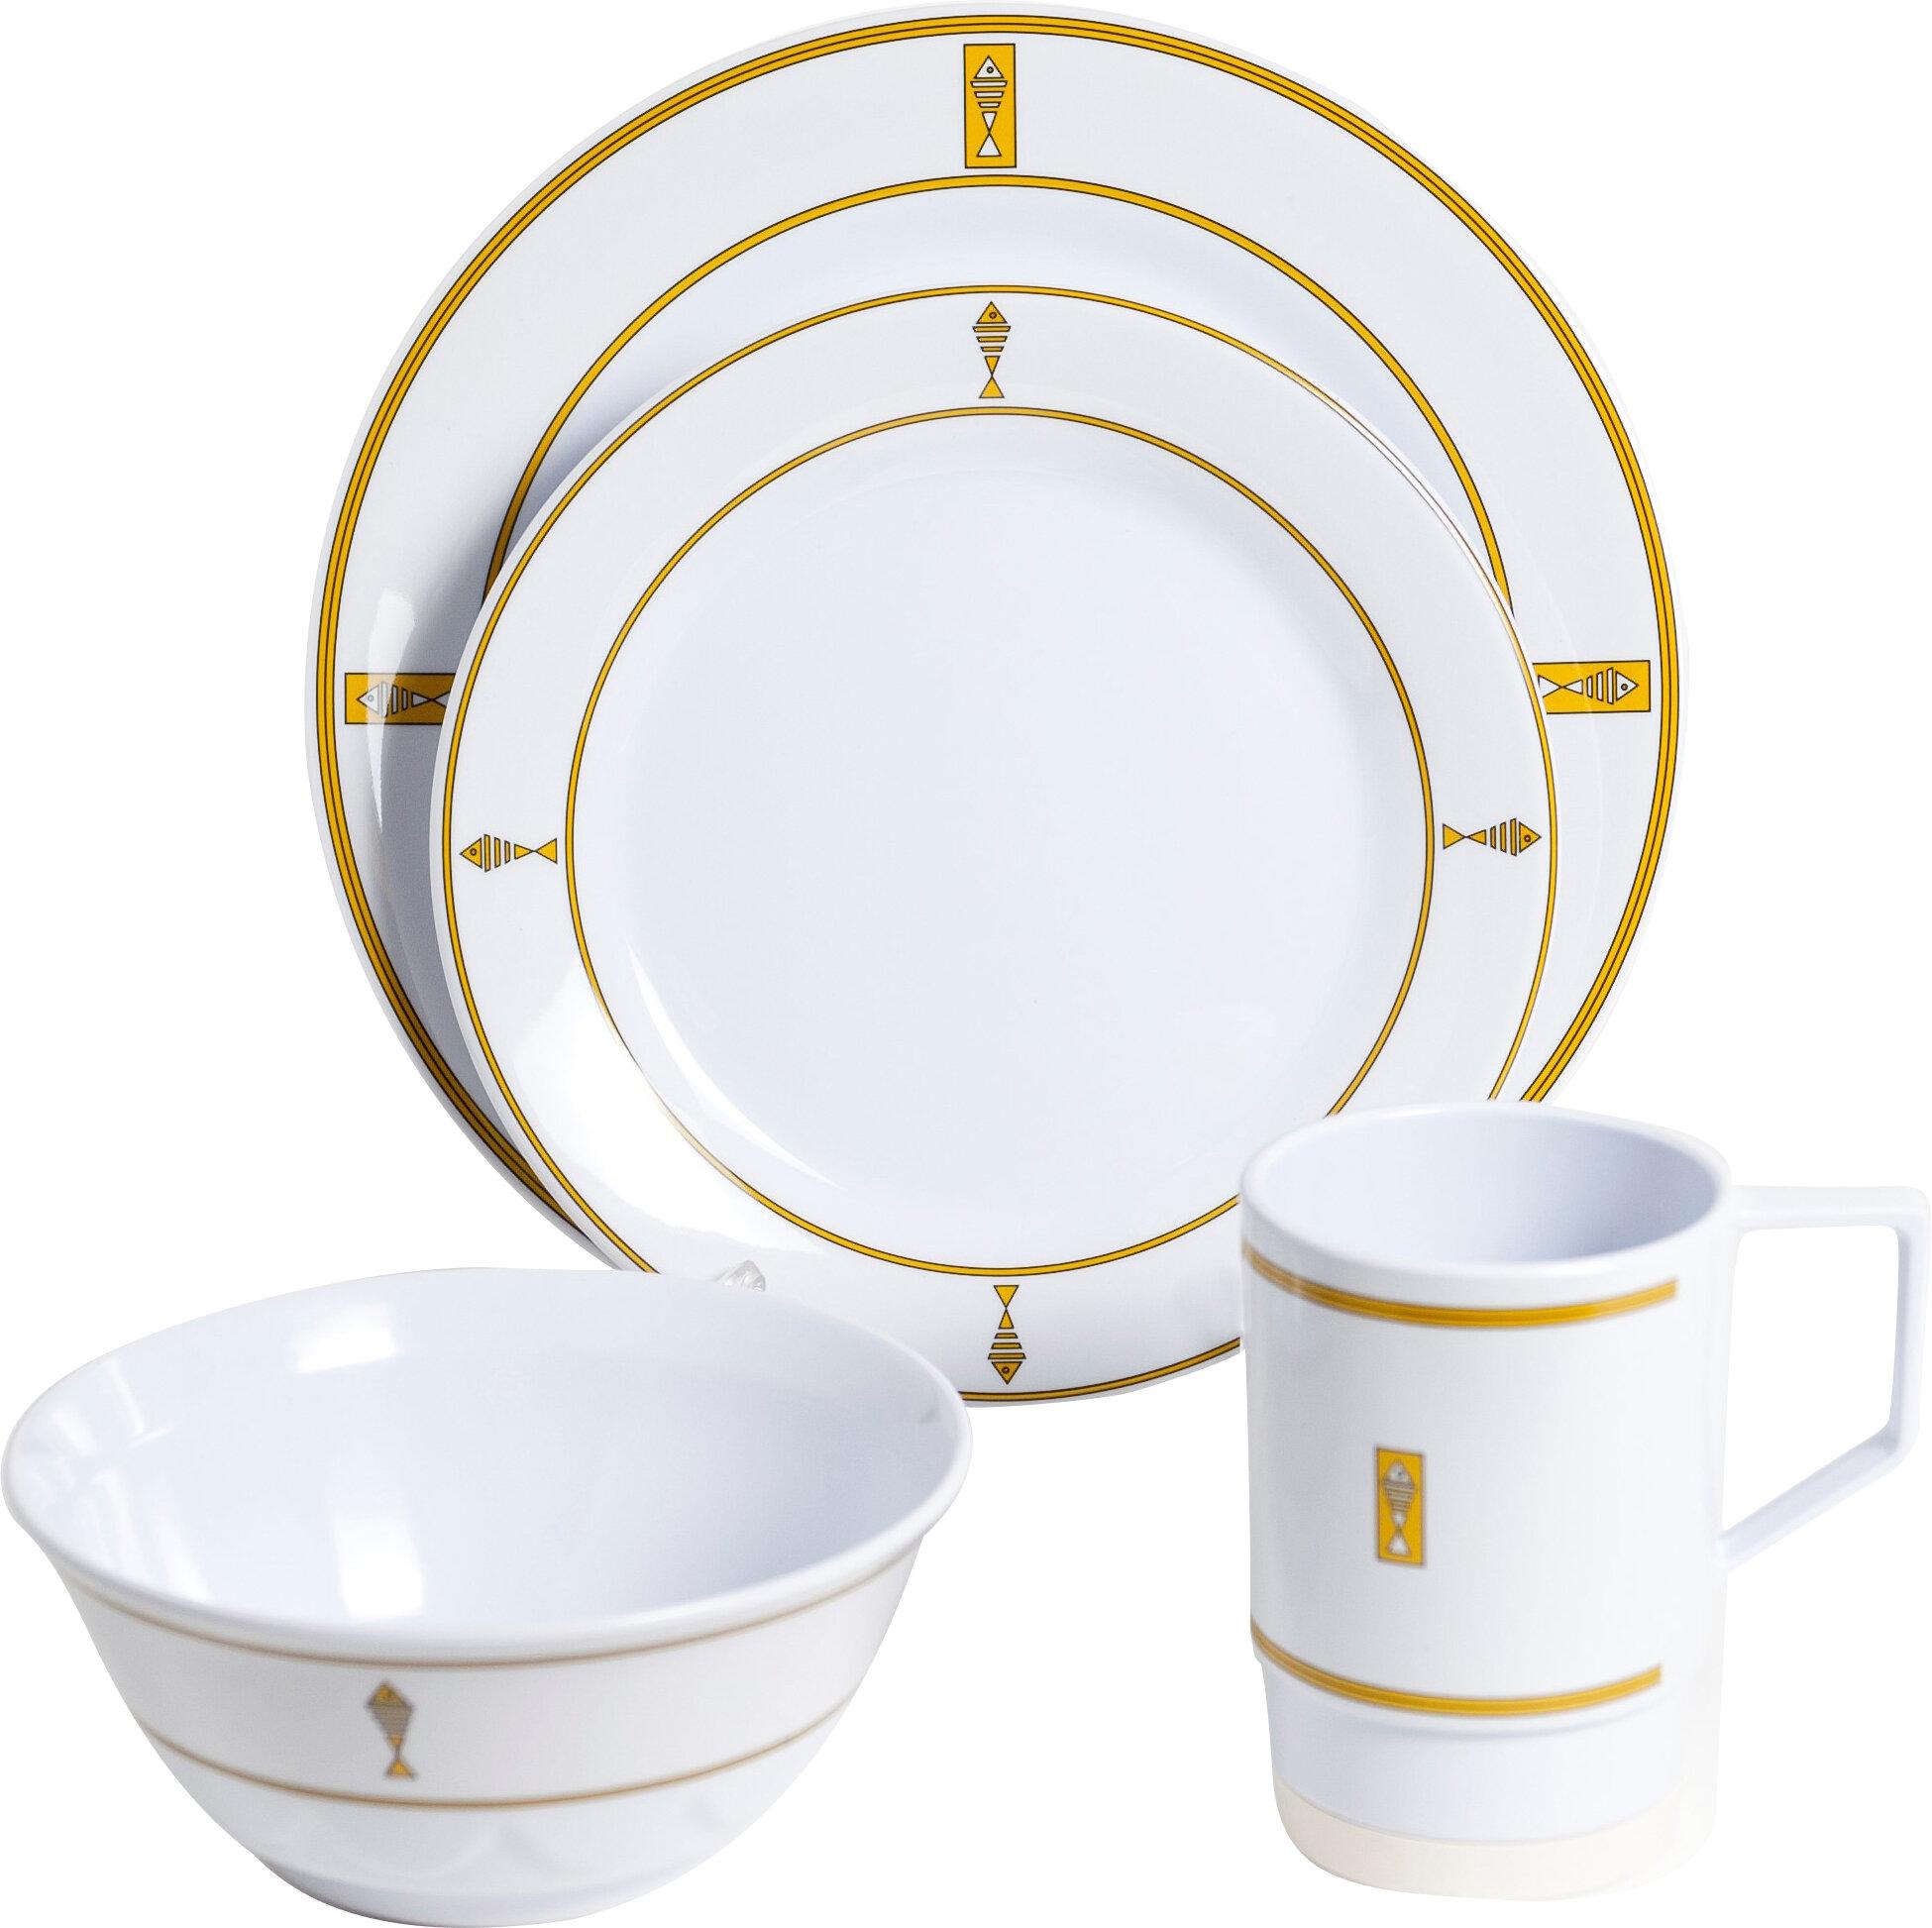 Galleyware Company Decorated Melamine Fish 24 Piece Dinnerware Set Service for 6 | Wayfair  sc 1 st  Wayfair & Galleyware Company Decorated Melamine Fish 24 Piece Dinnerware Set ...